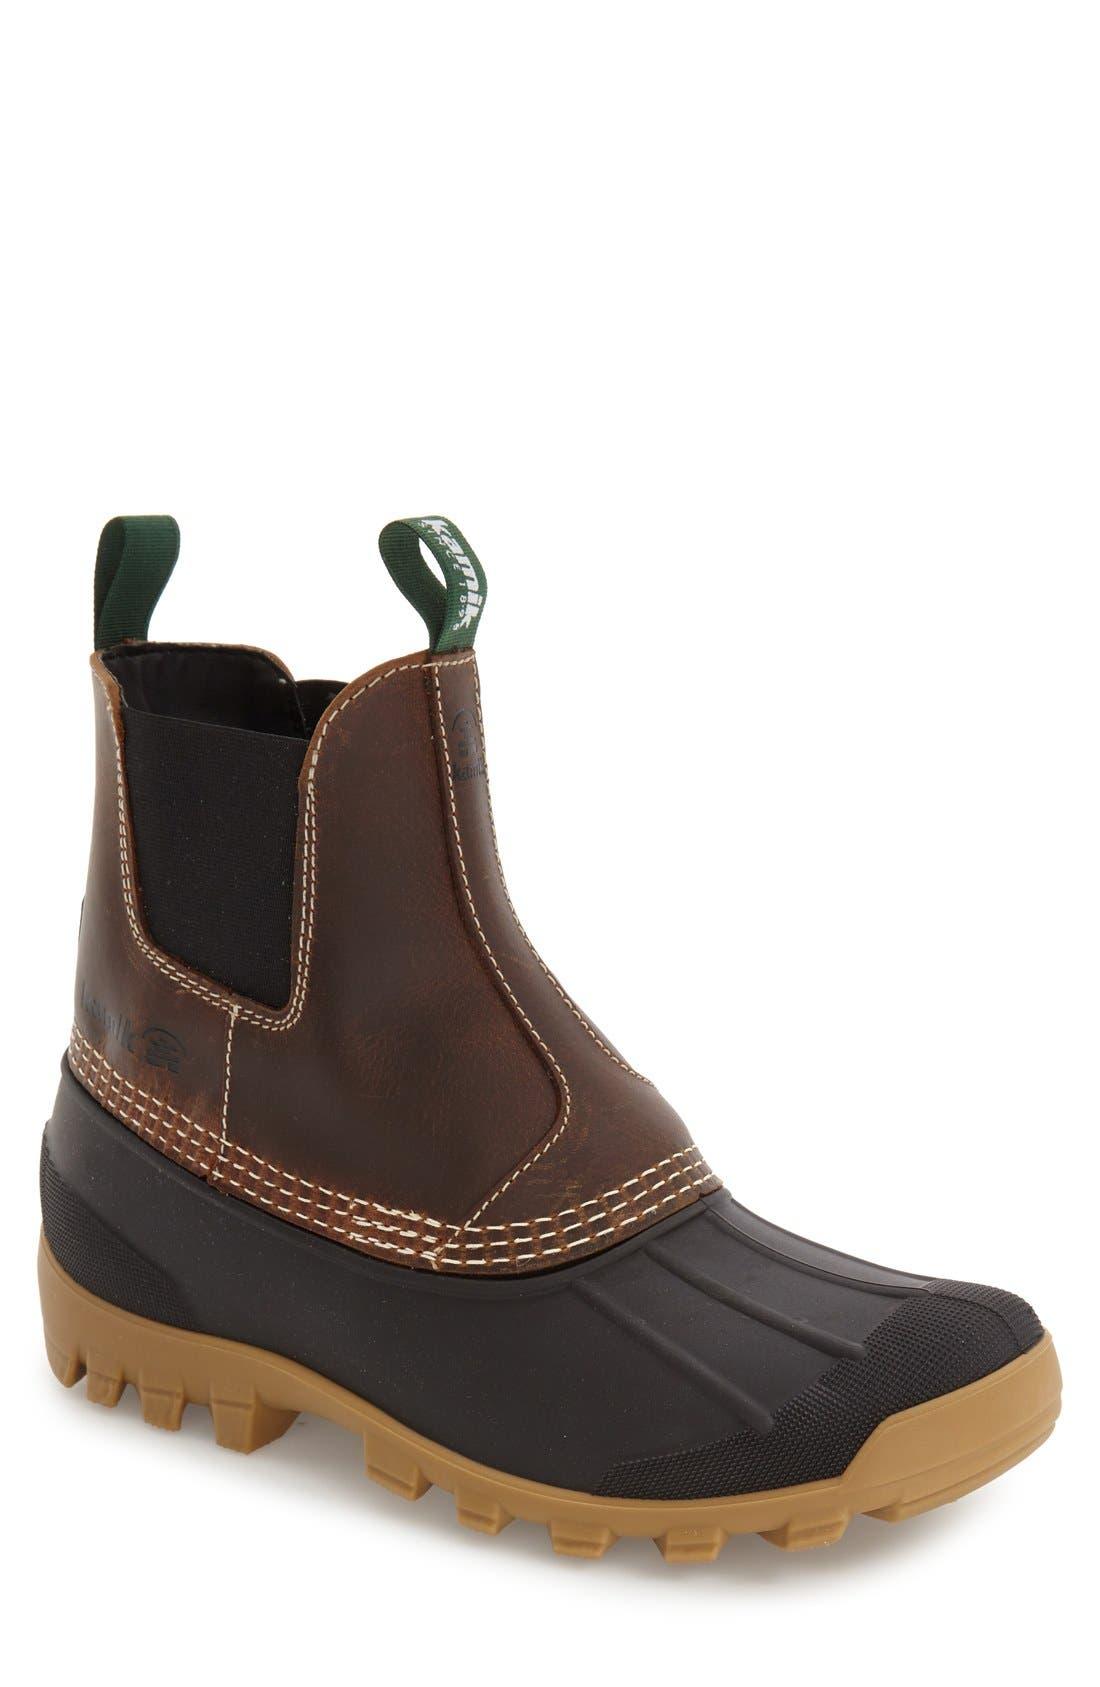 Yukon C Snow Waterproof Boot,                             Main thumbnail 1, color,                             DARK BROWN LEATHER